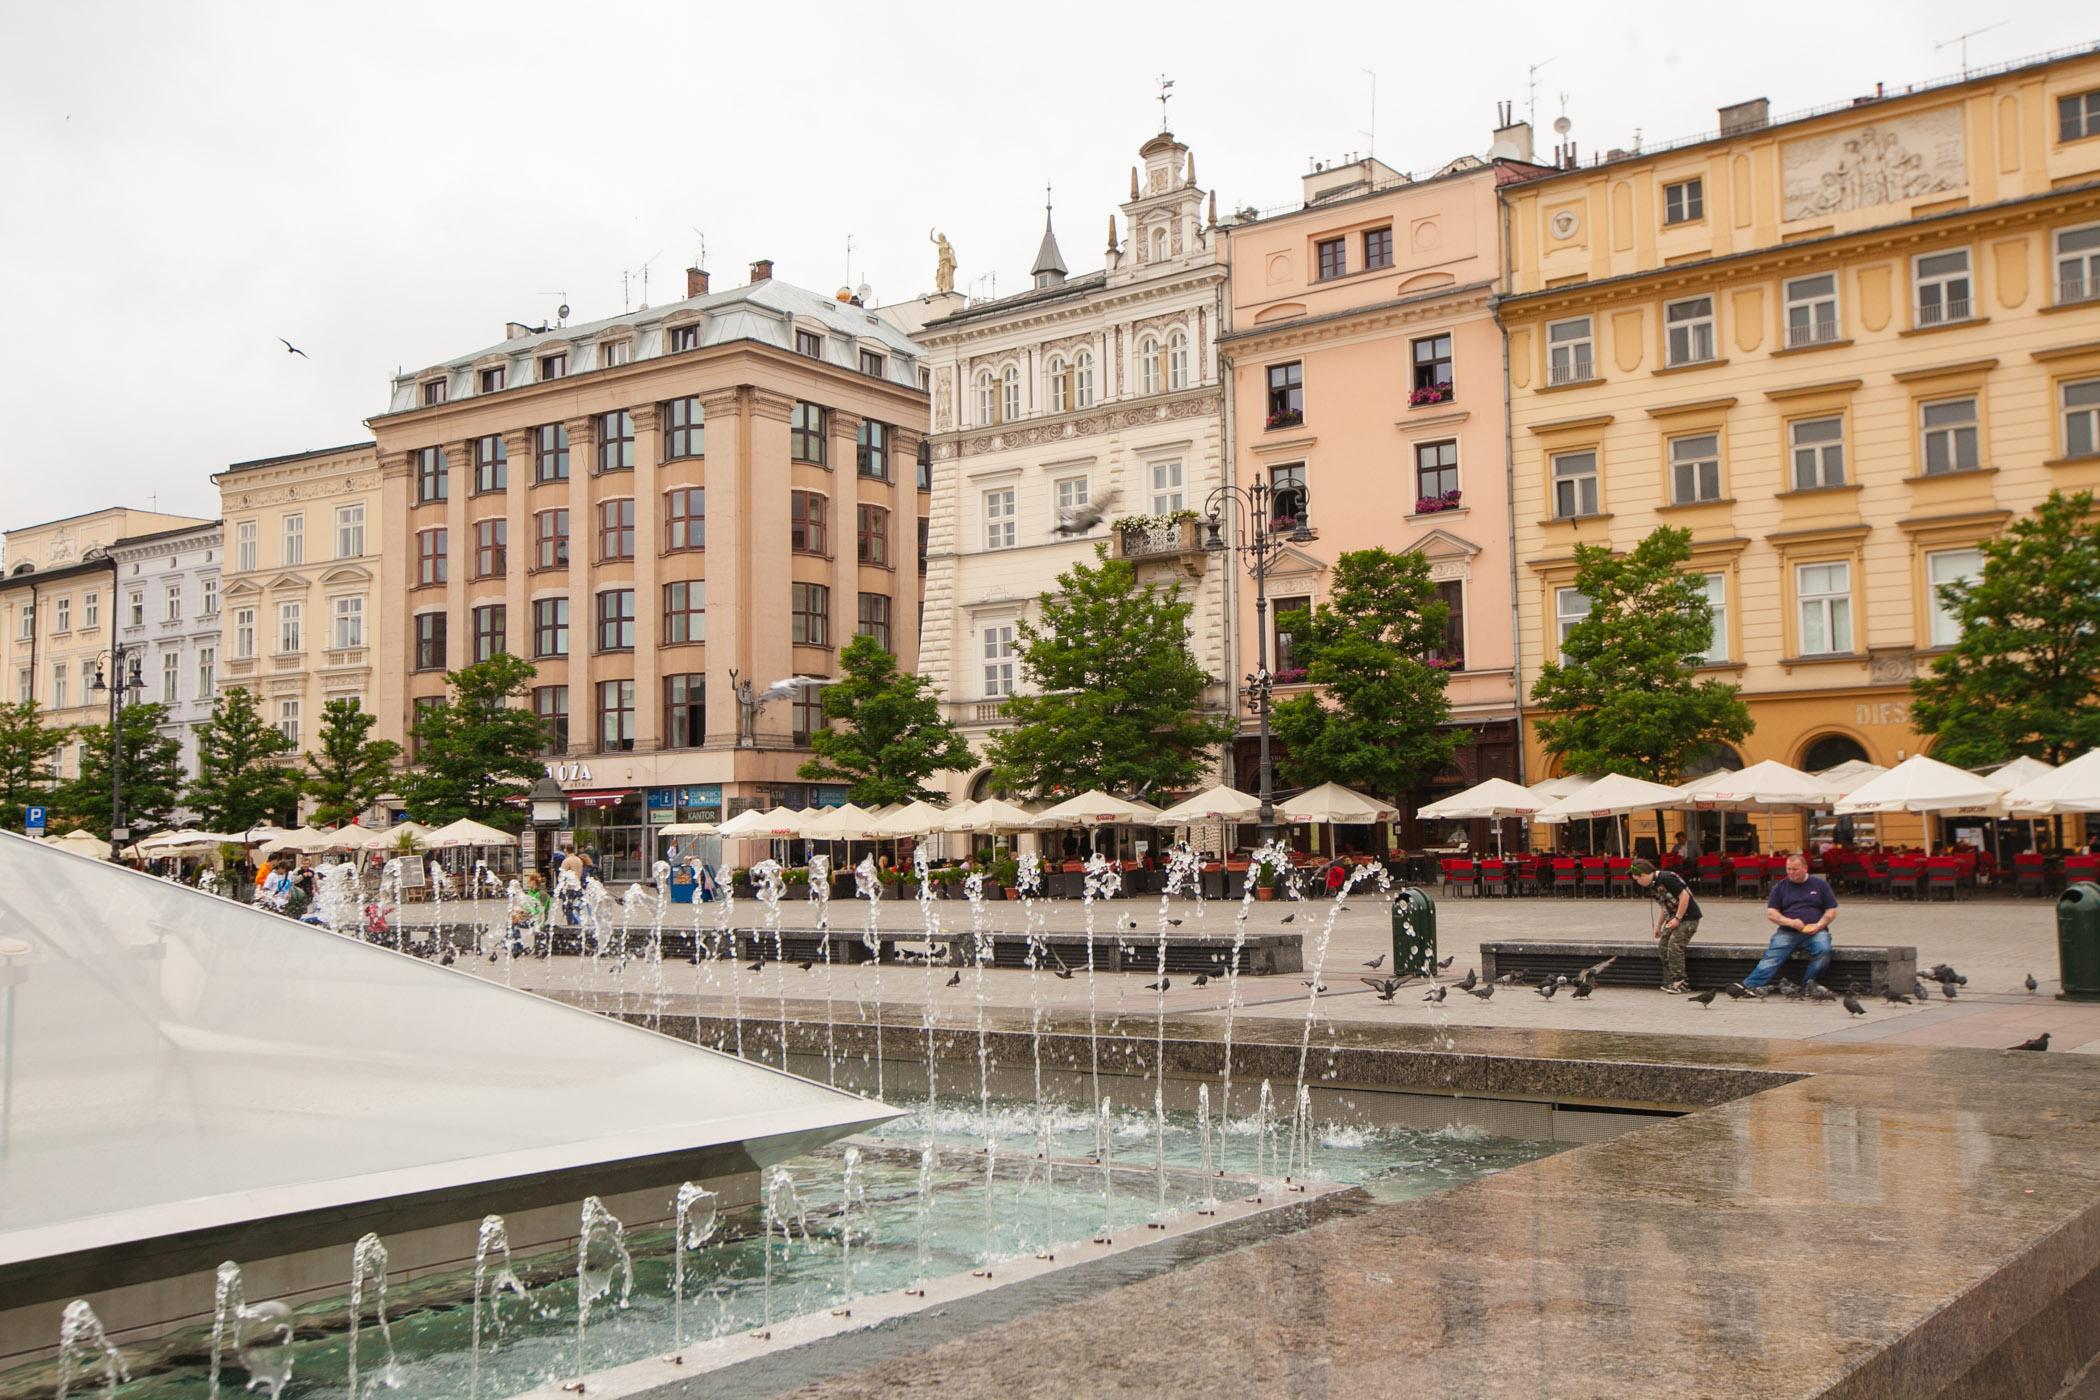 Buildings along Krakow Main Square